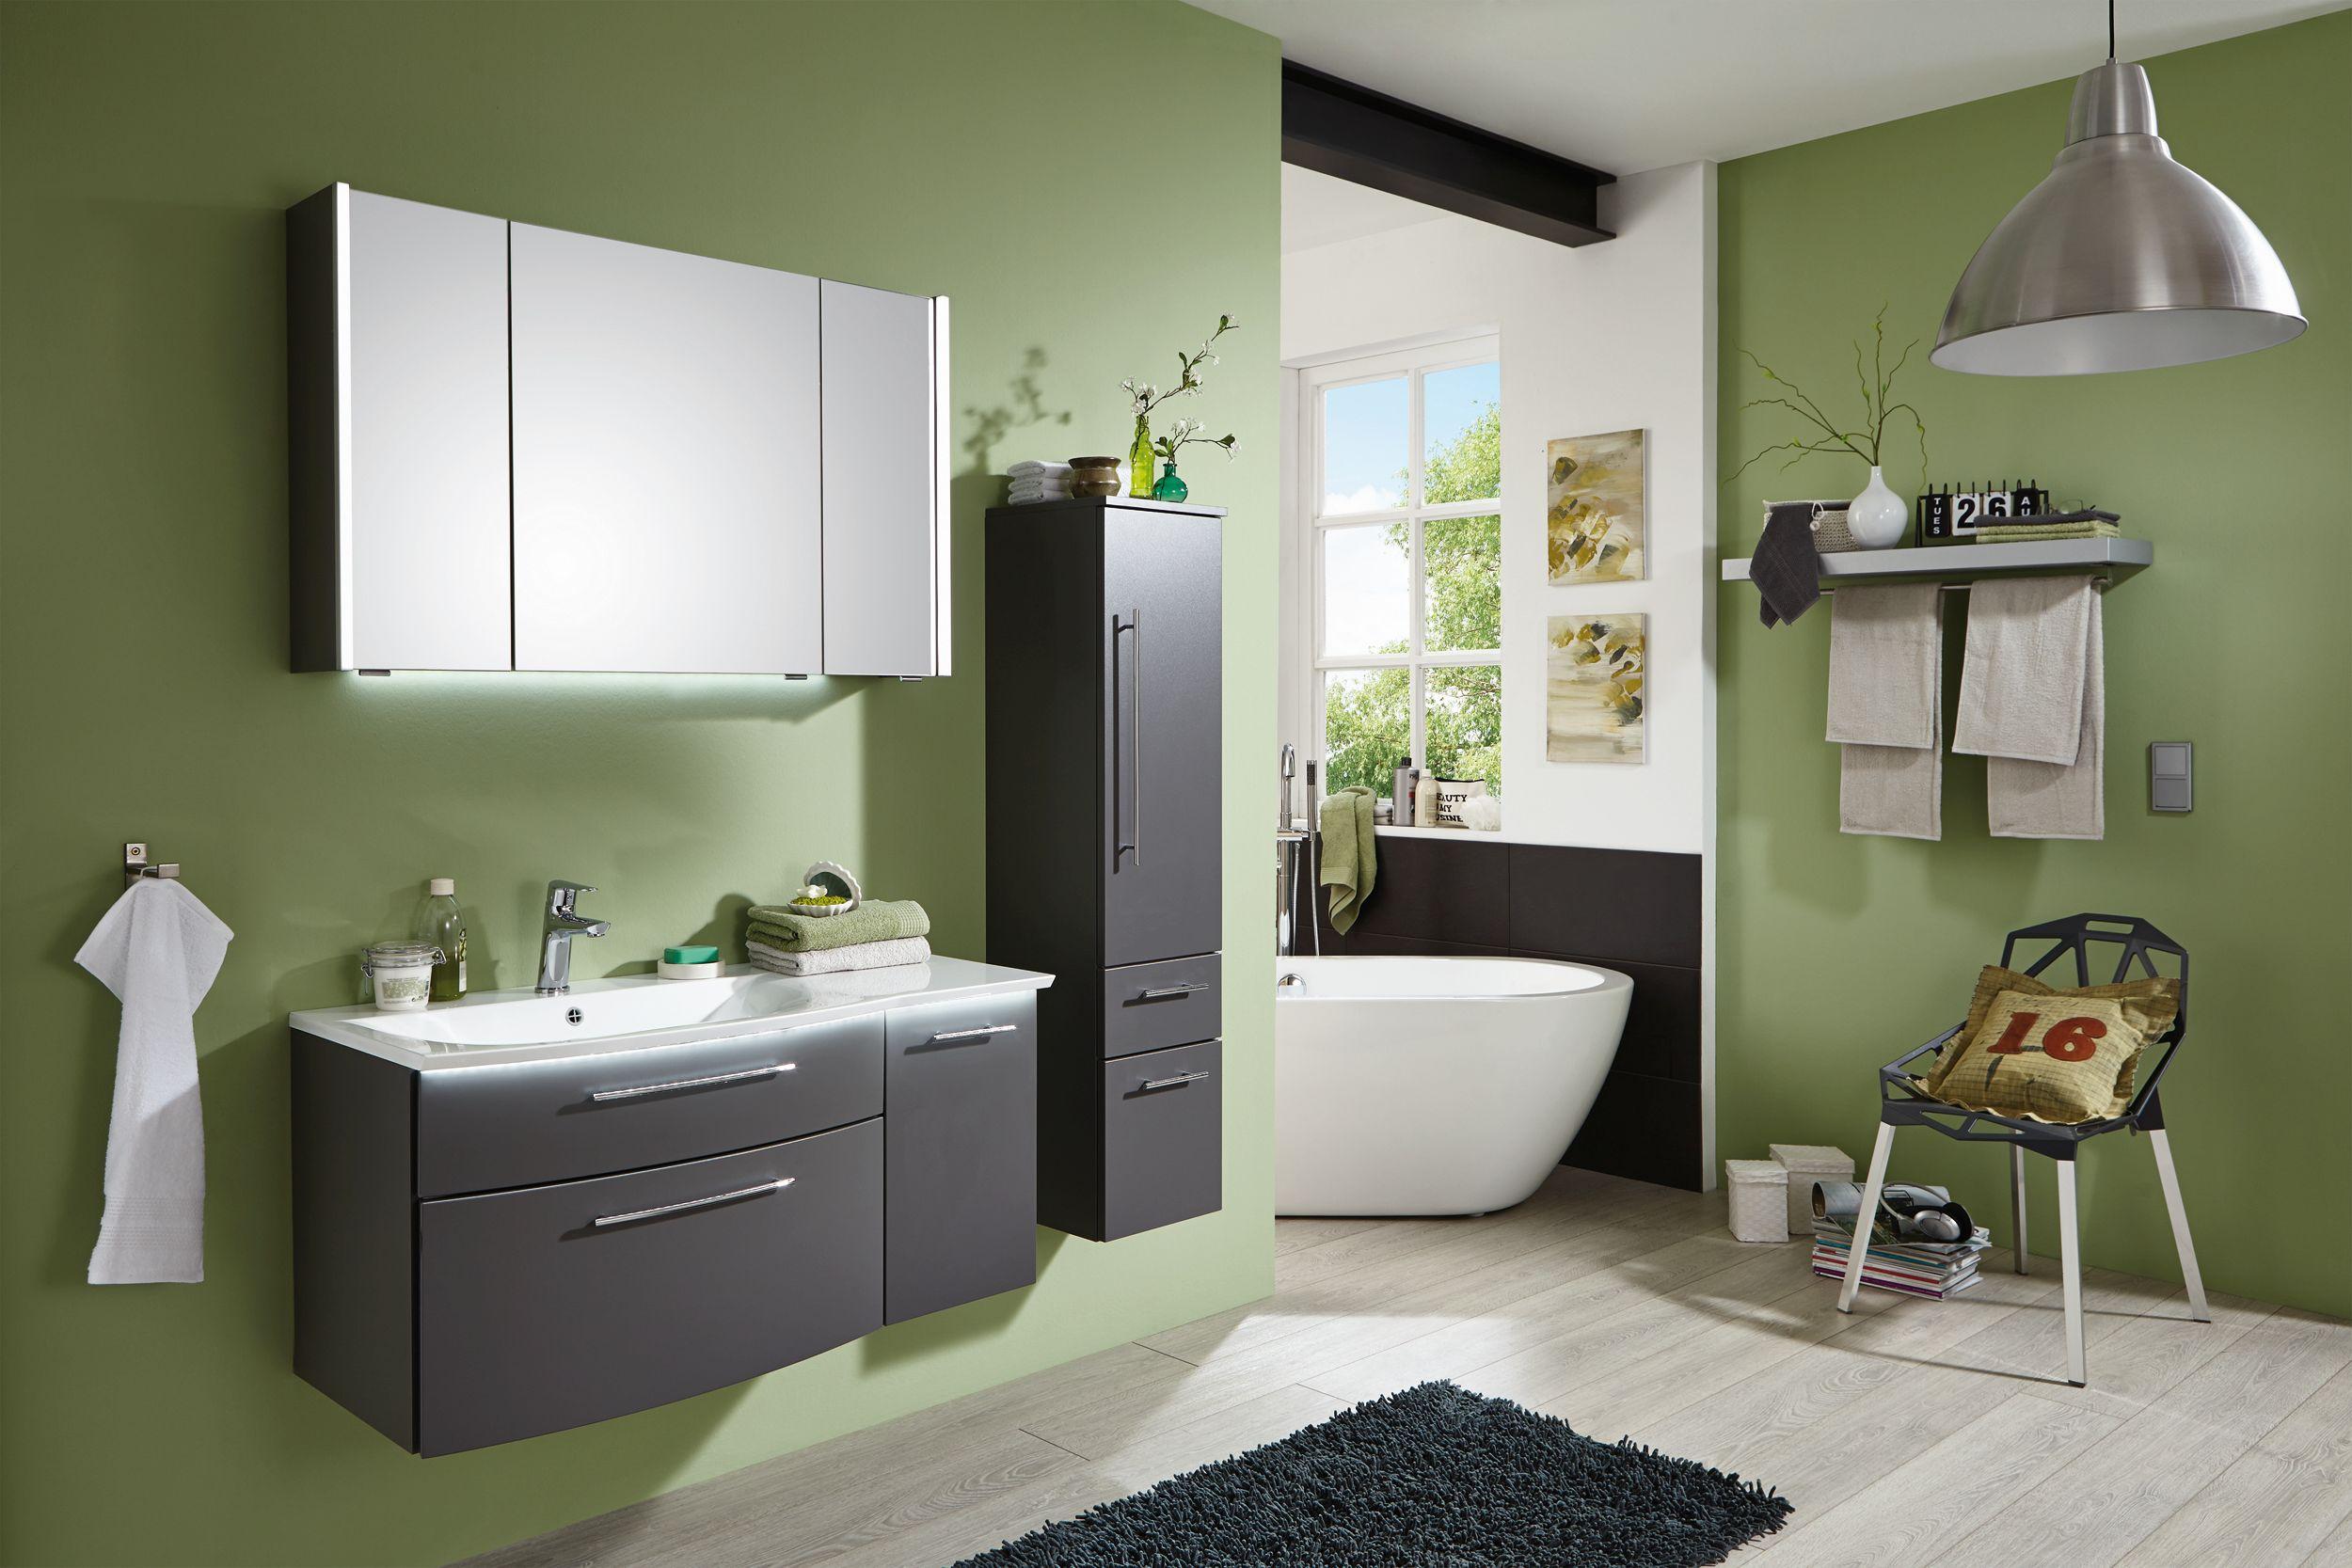 puris linea bad spiegelschrank 100 cm breit s2a431079. Black Bedroom Furniture Sets. Home Design Ideas